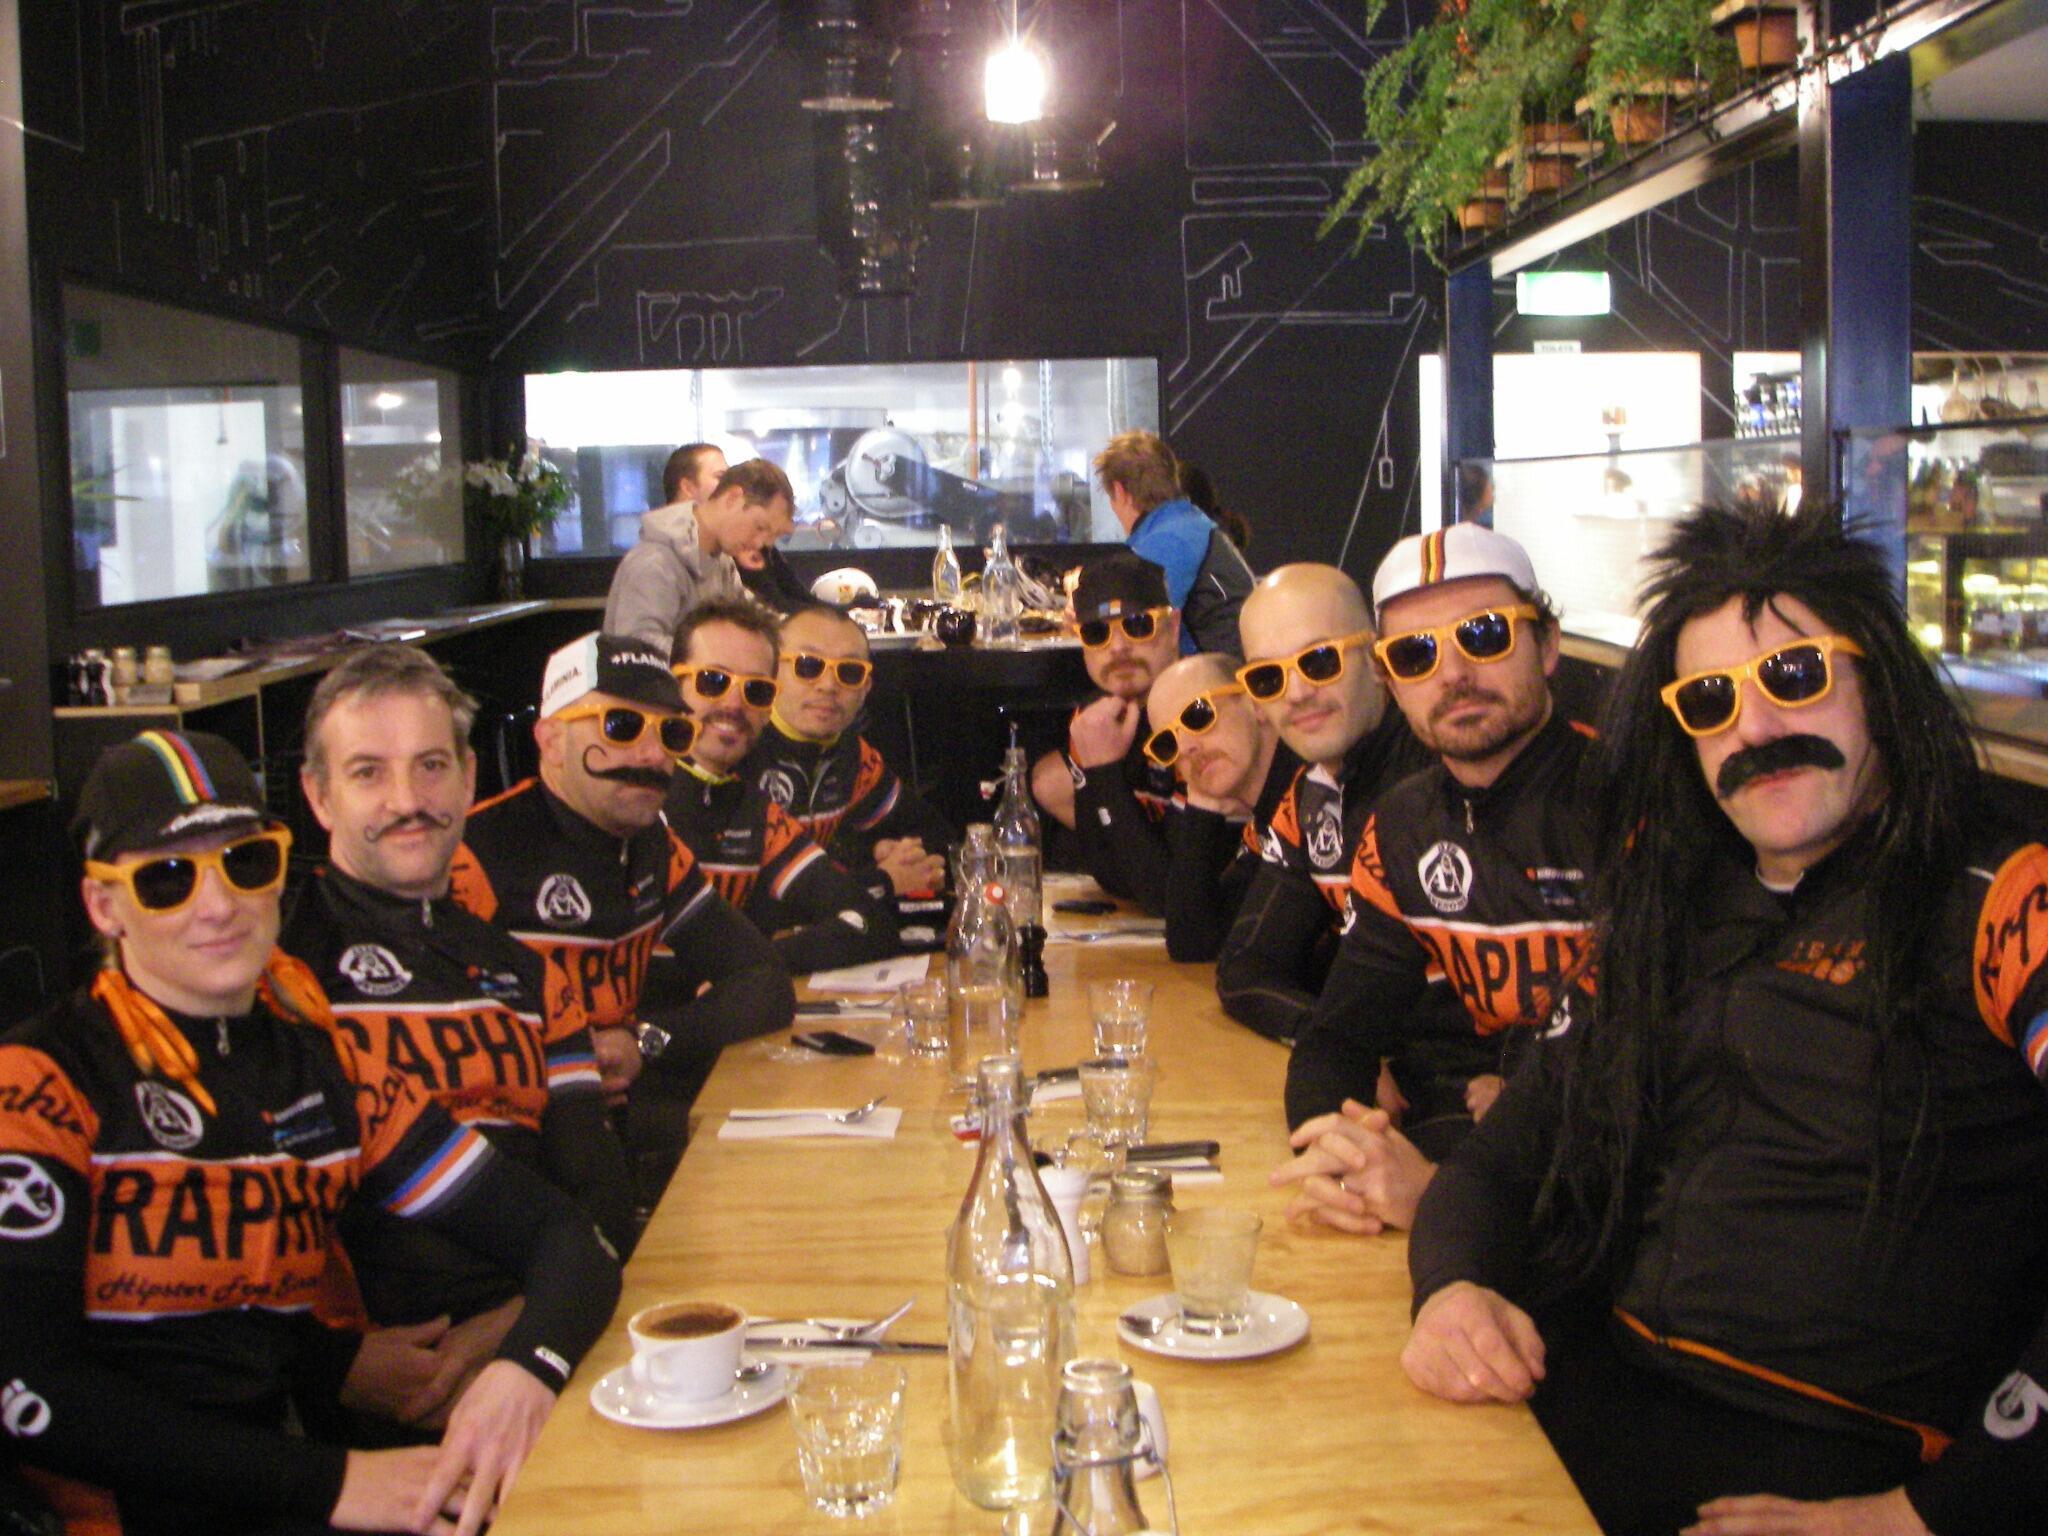 Team @raphiaracing expressing their unbridled enthusiasm for their Freetrade espresso's  #melburnroobaix http://t.co/2bbKT3rMwB